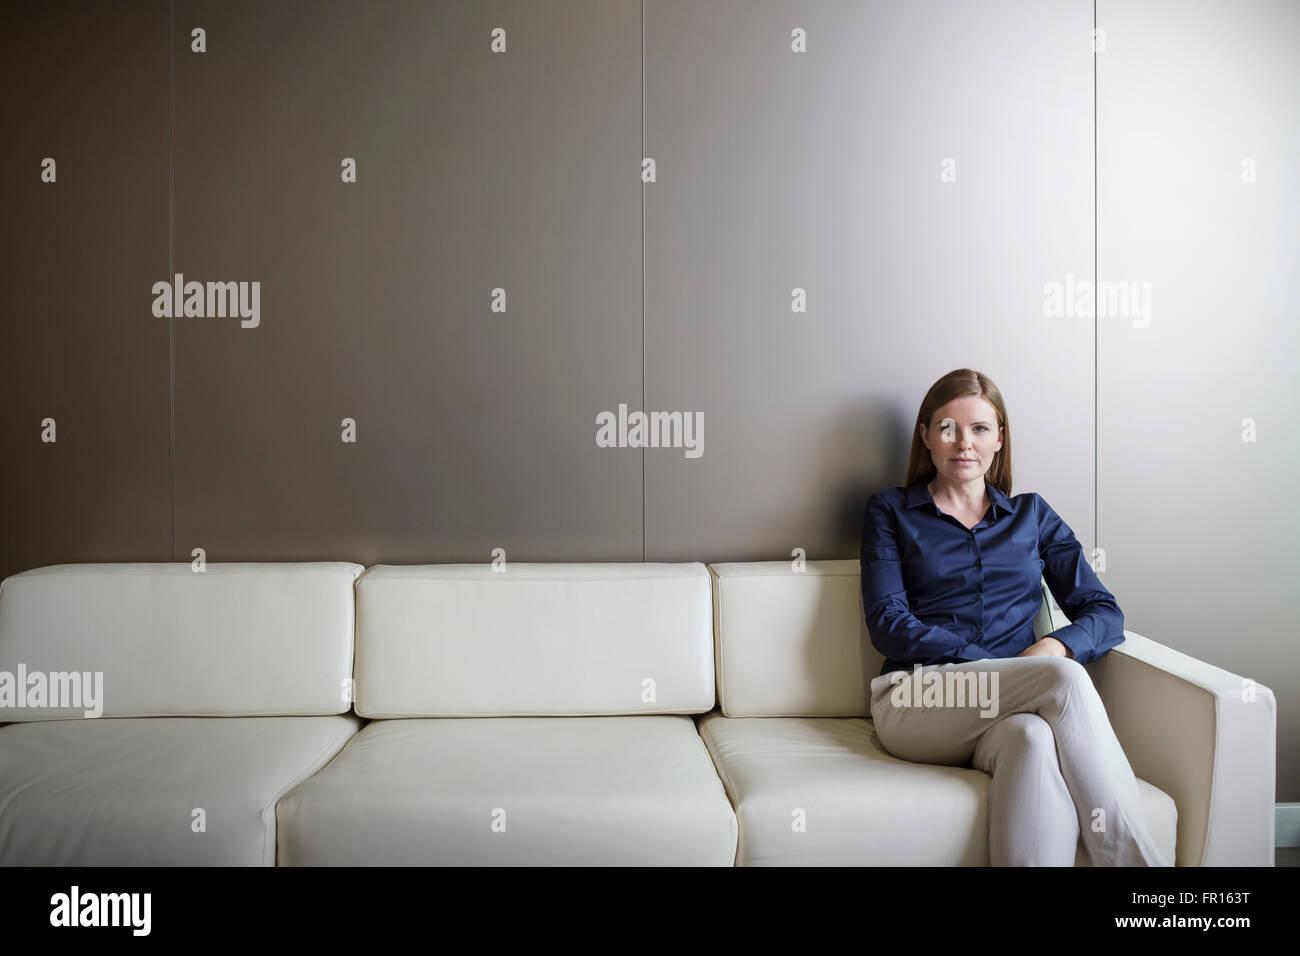 Portrait confident businesswoman with legs crossed on sofa - Stock Image